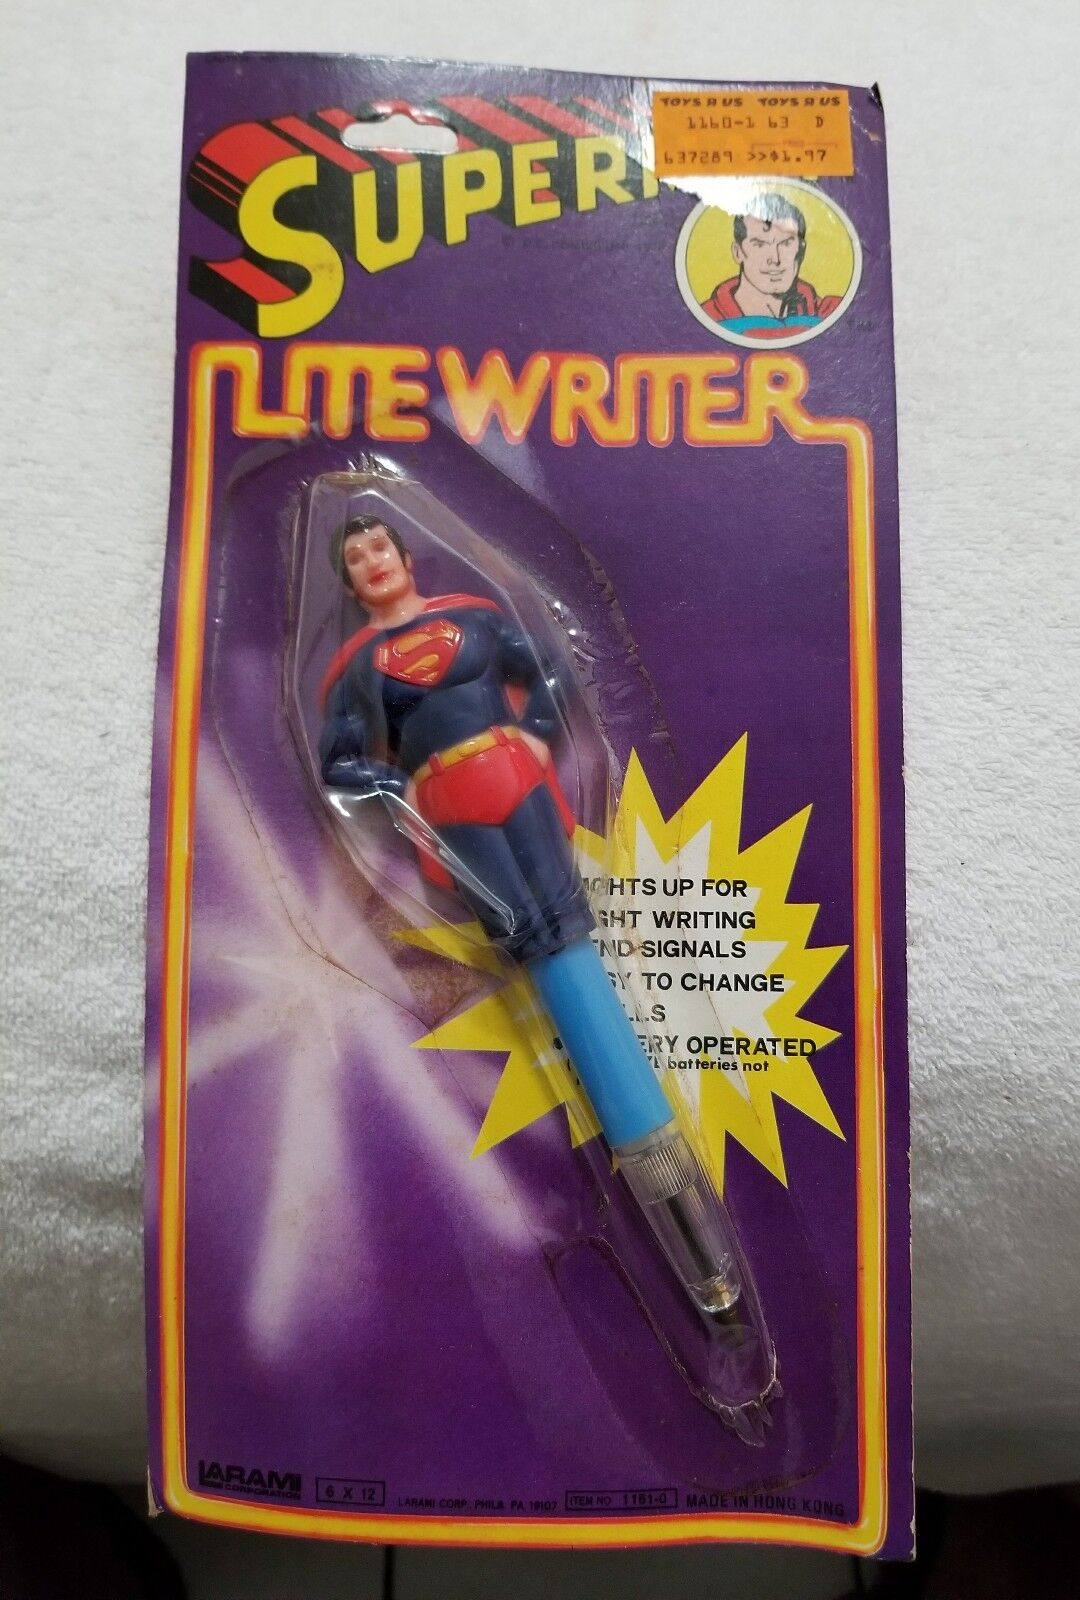 1978 Larami Corp. Corp. Corp. Superman Litewriter (NIP) 850289